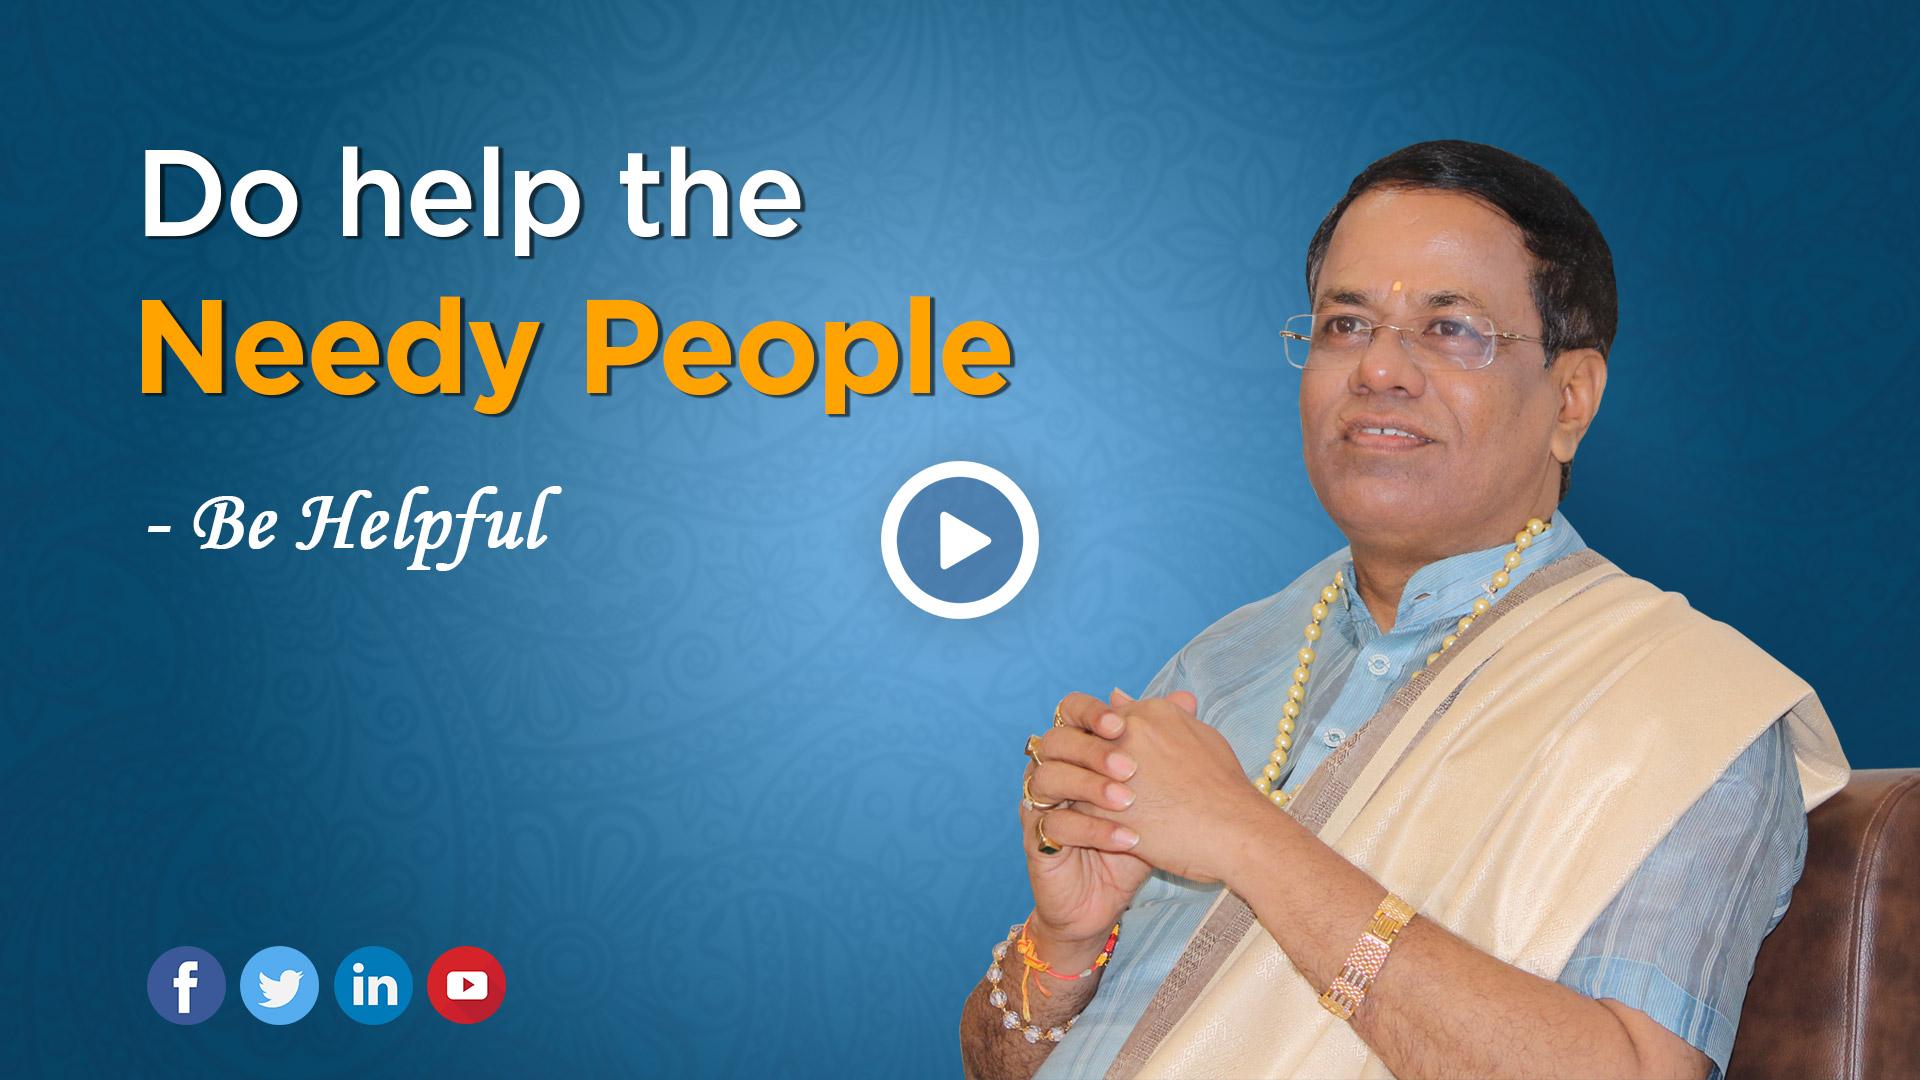 Helpful - Do Help the Needy People